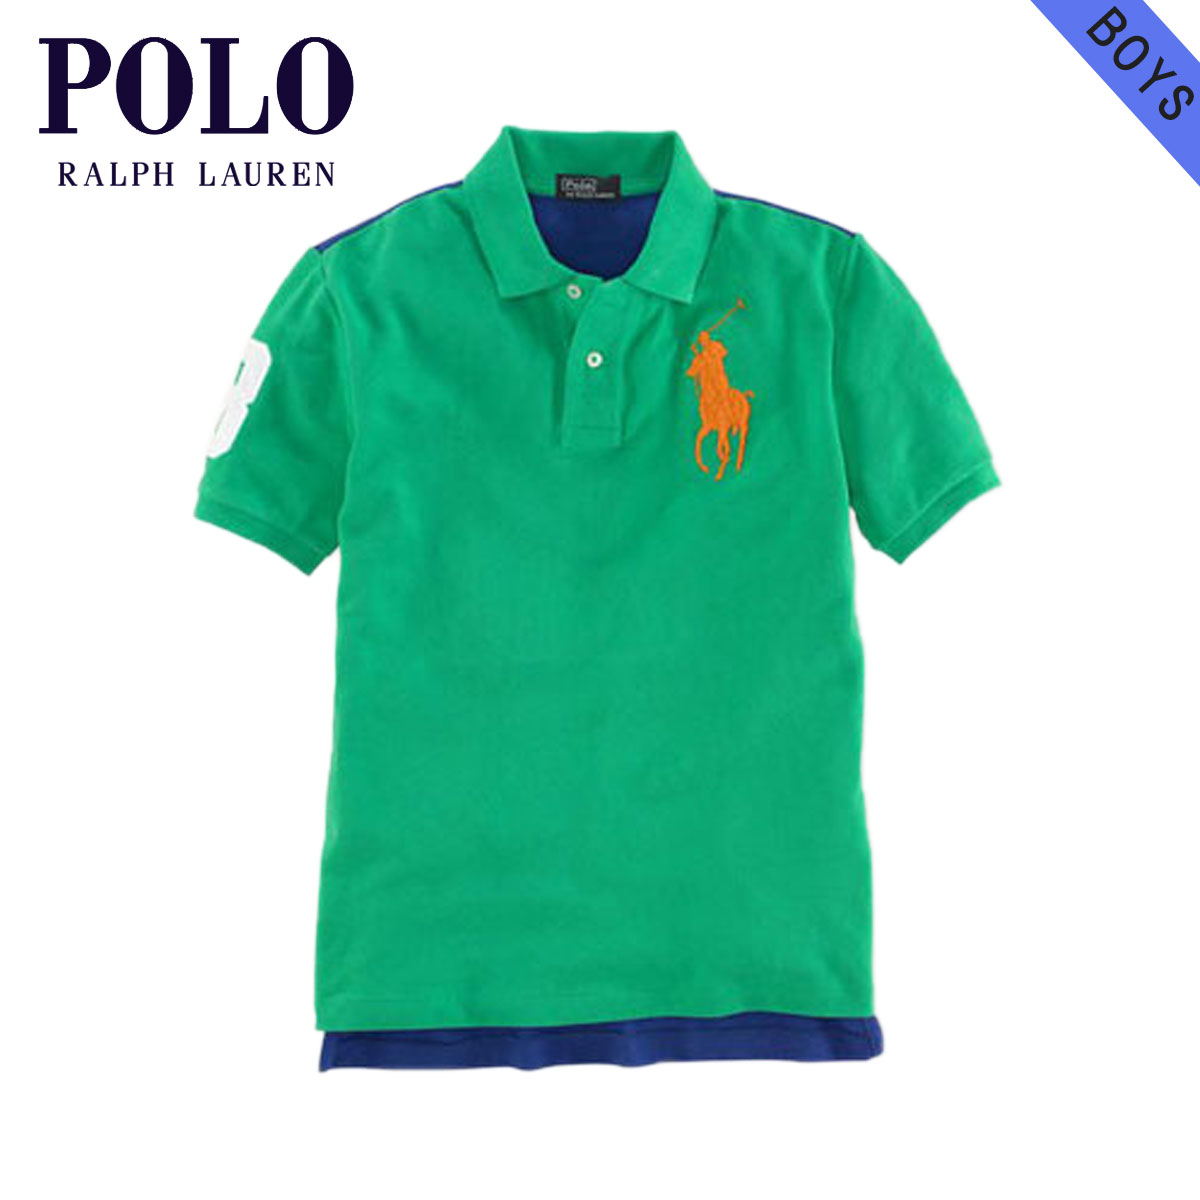 Rakuten Ichiba shop MIXON  Polo Ralph Lauren kids POLO RALPH LAUREN CHILDREN  regular article children s clothes Boys polo shirt Big Pony Mesh Polo   18121236 ... f701f48df